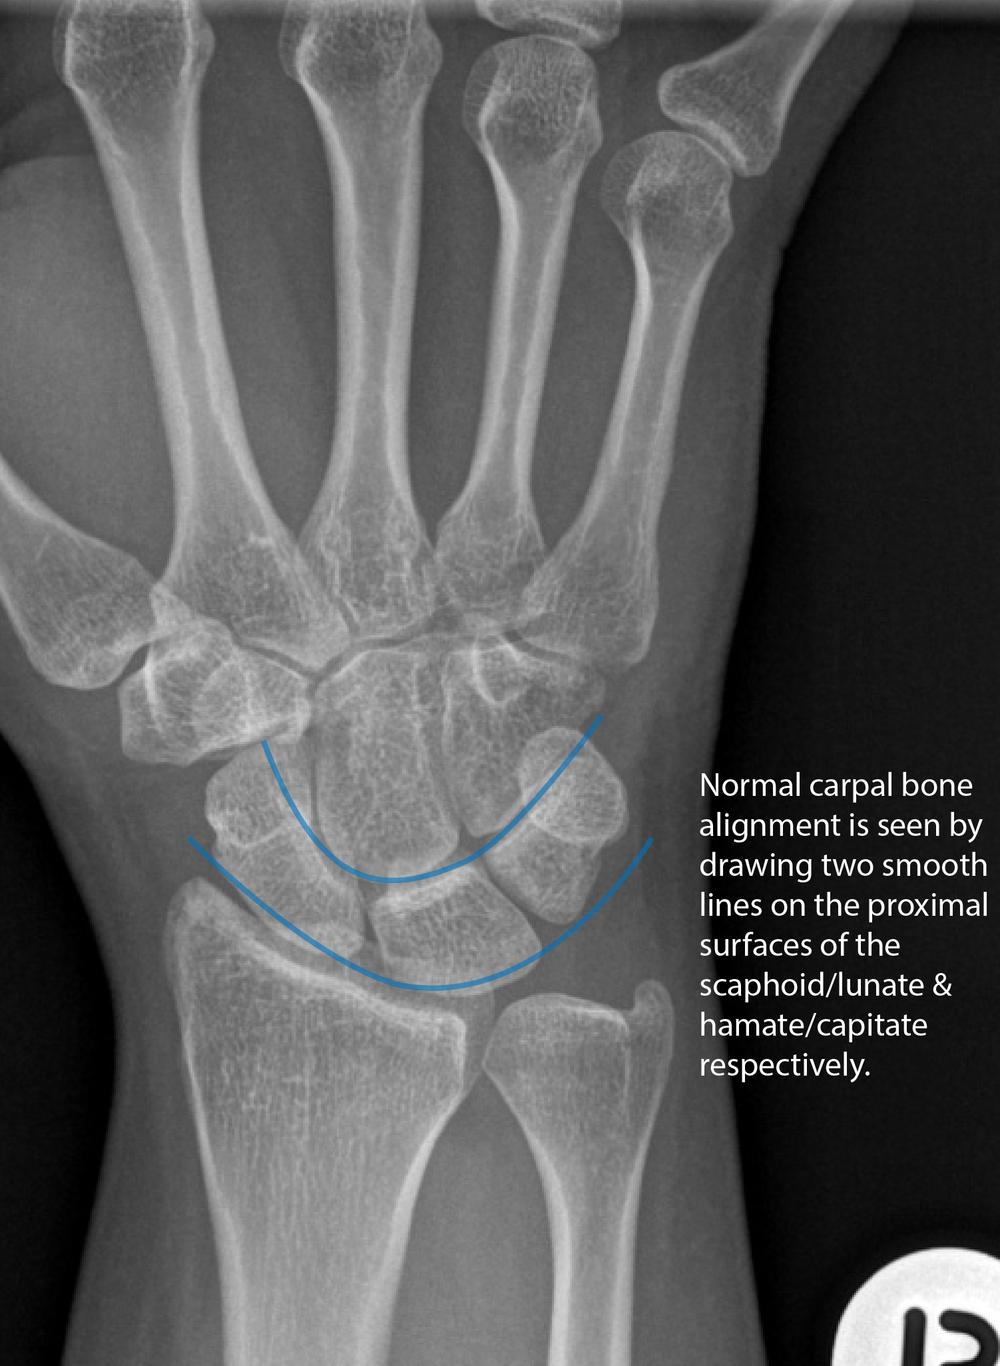 Normal Carpal Bone Contour on AP Radiograph